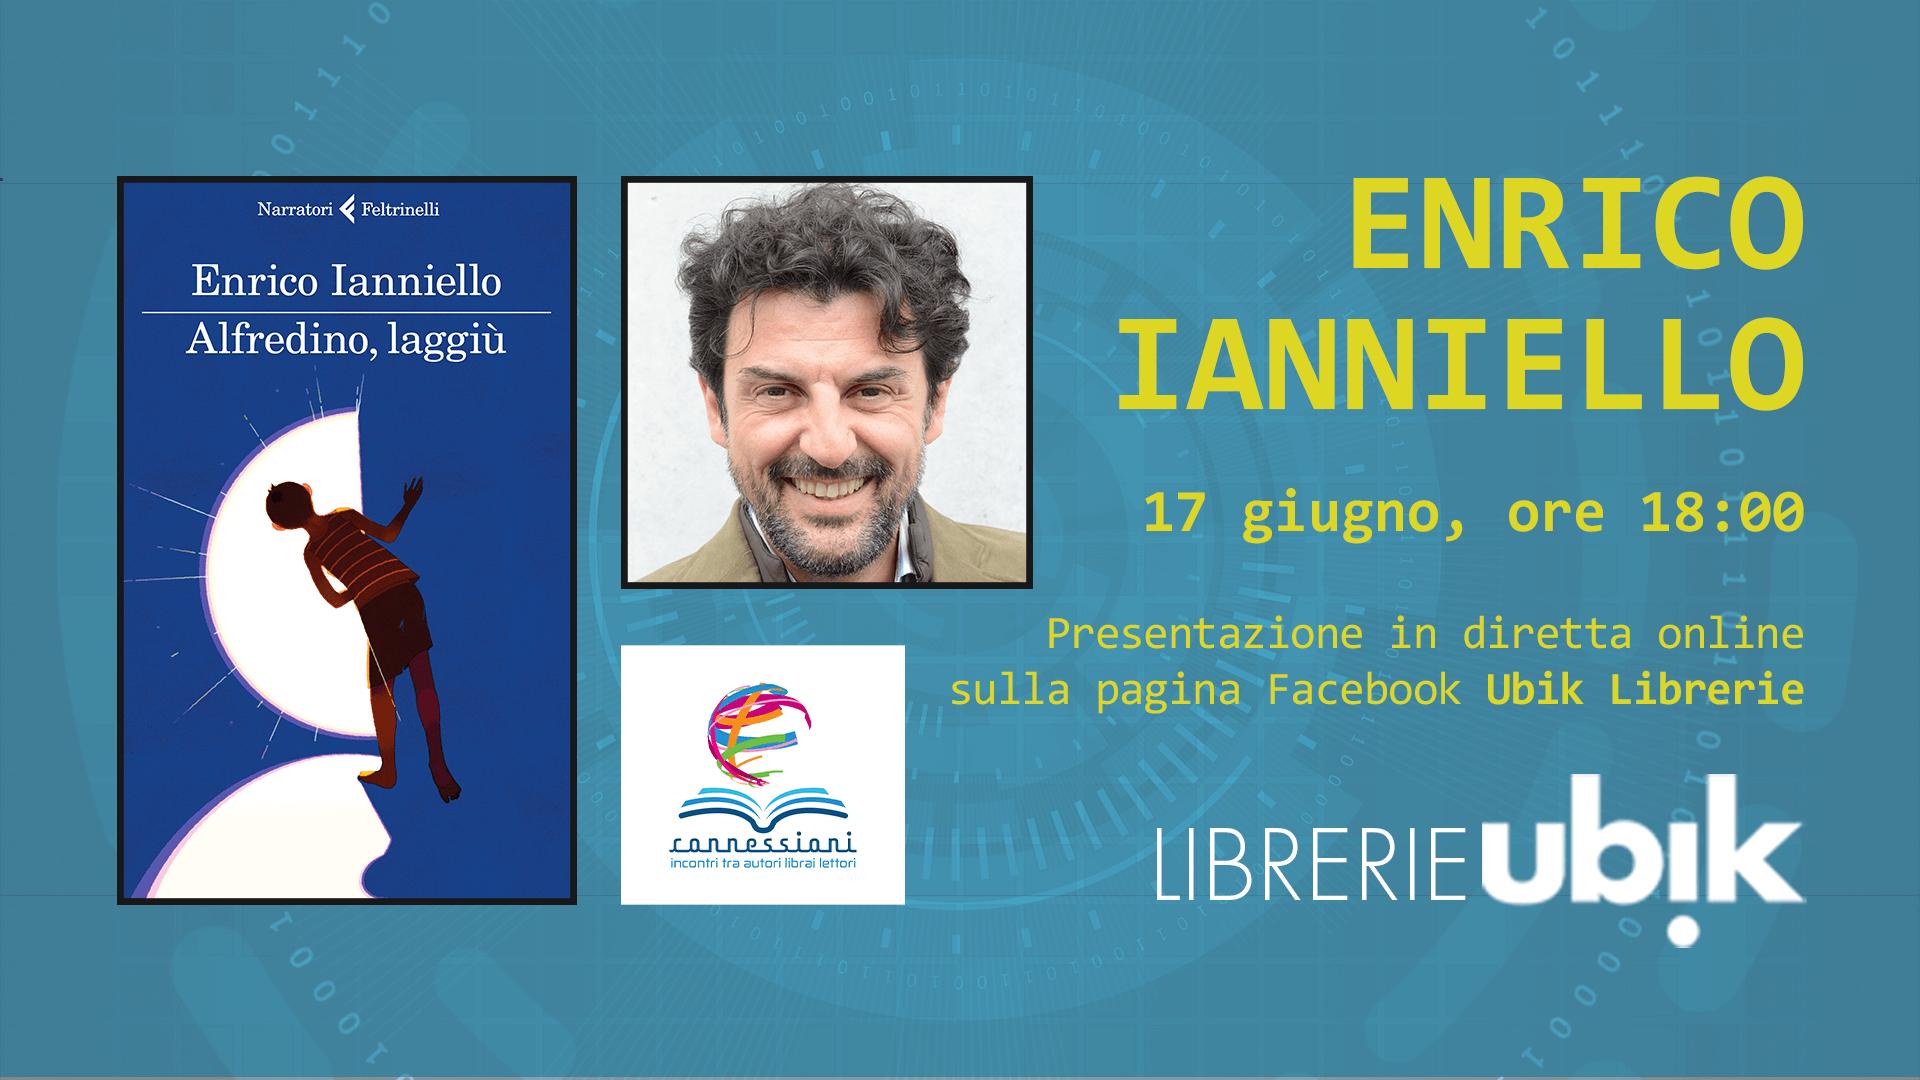 ENRICO IANNIELLO presenta